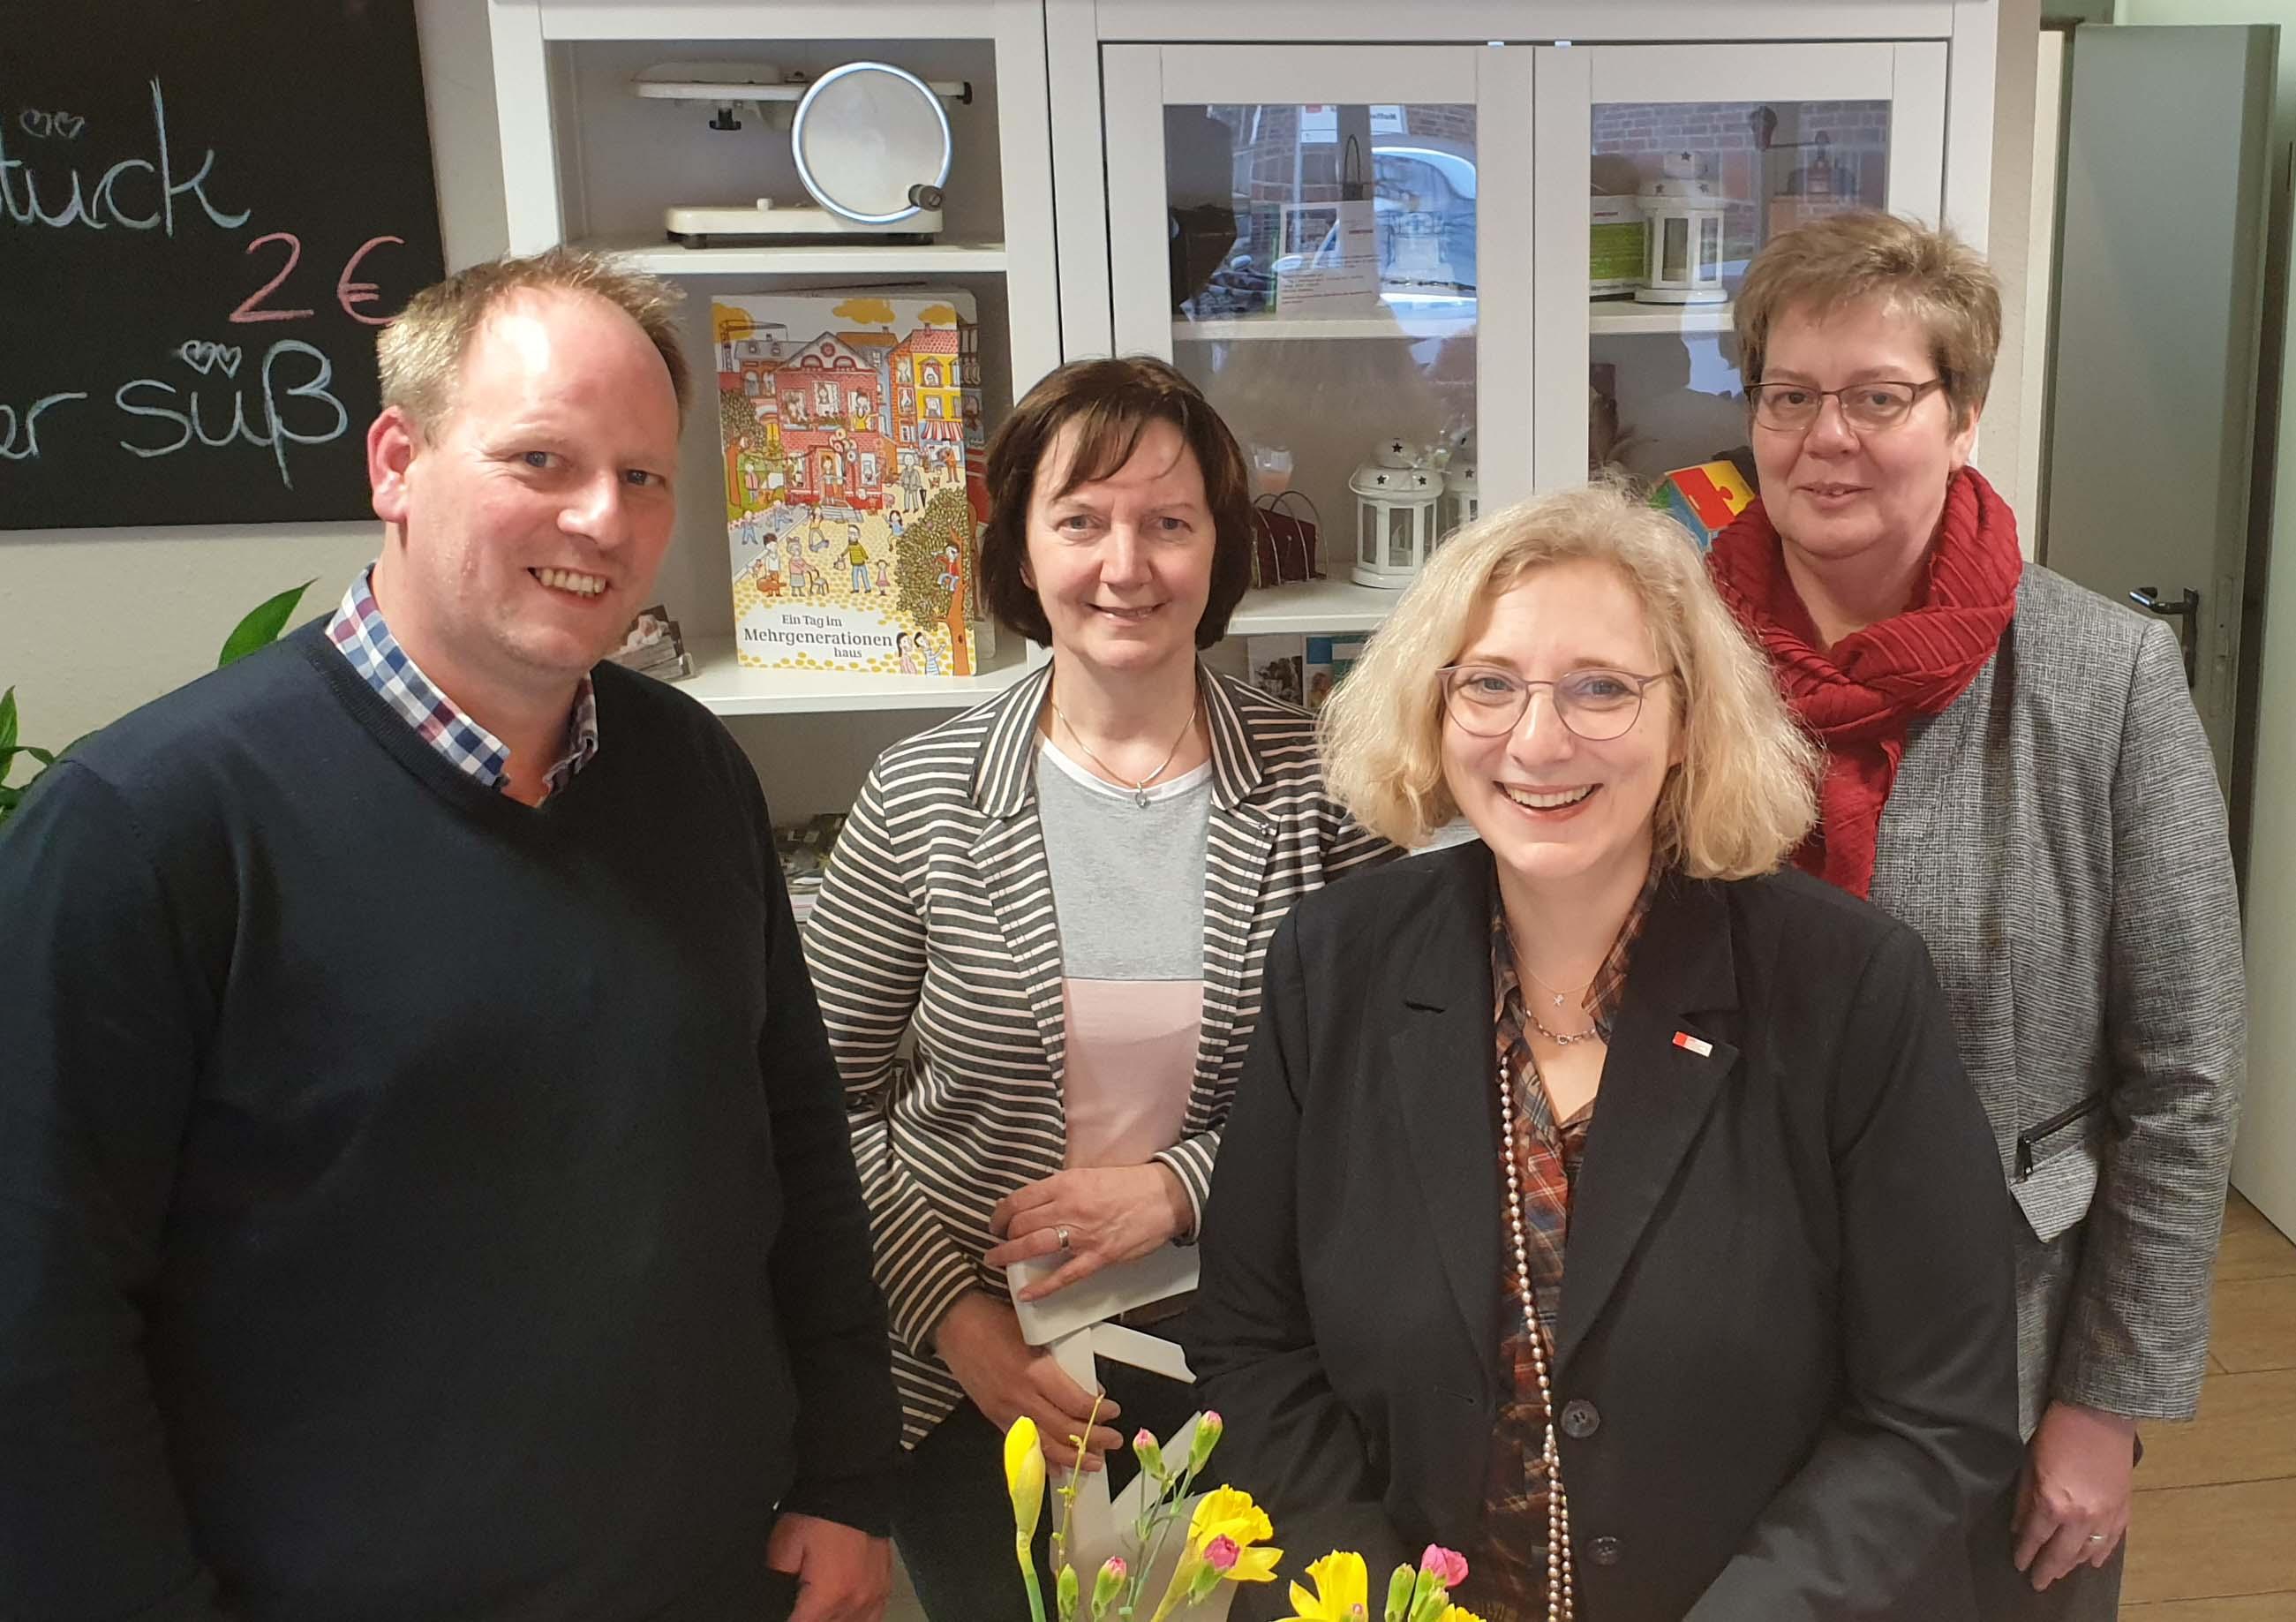 V.l.n.r.: Frank Lüßling, Gisela Bolmer, Dr. Daniela De Ridder, Marita Theilen